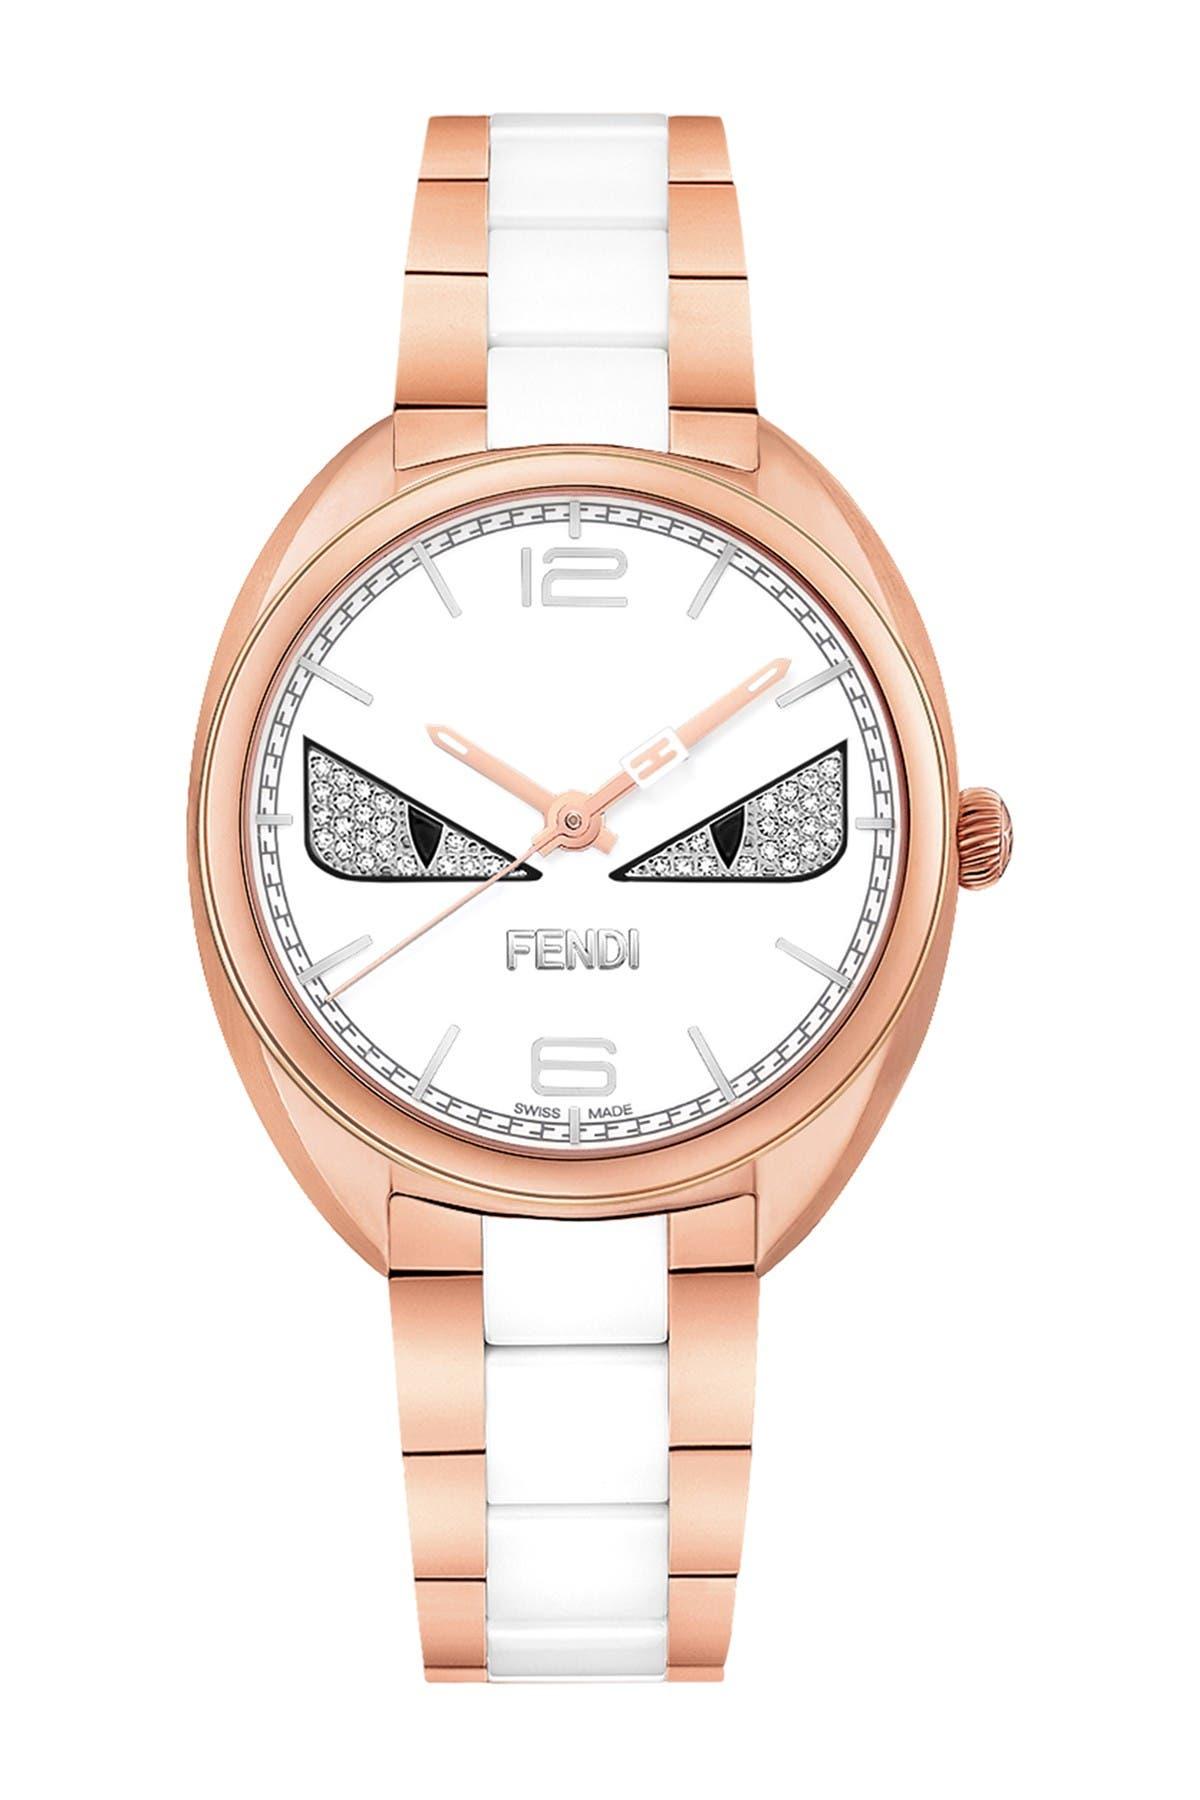 Image of FENDI Women's Momento Fendi Bugs Quartz Bracelet Watch, 34mm